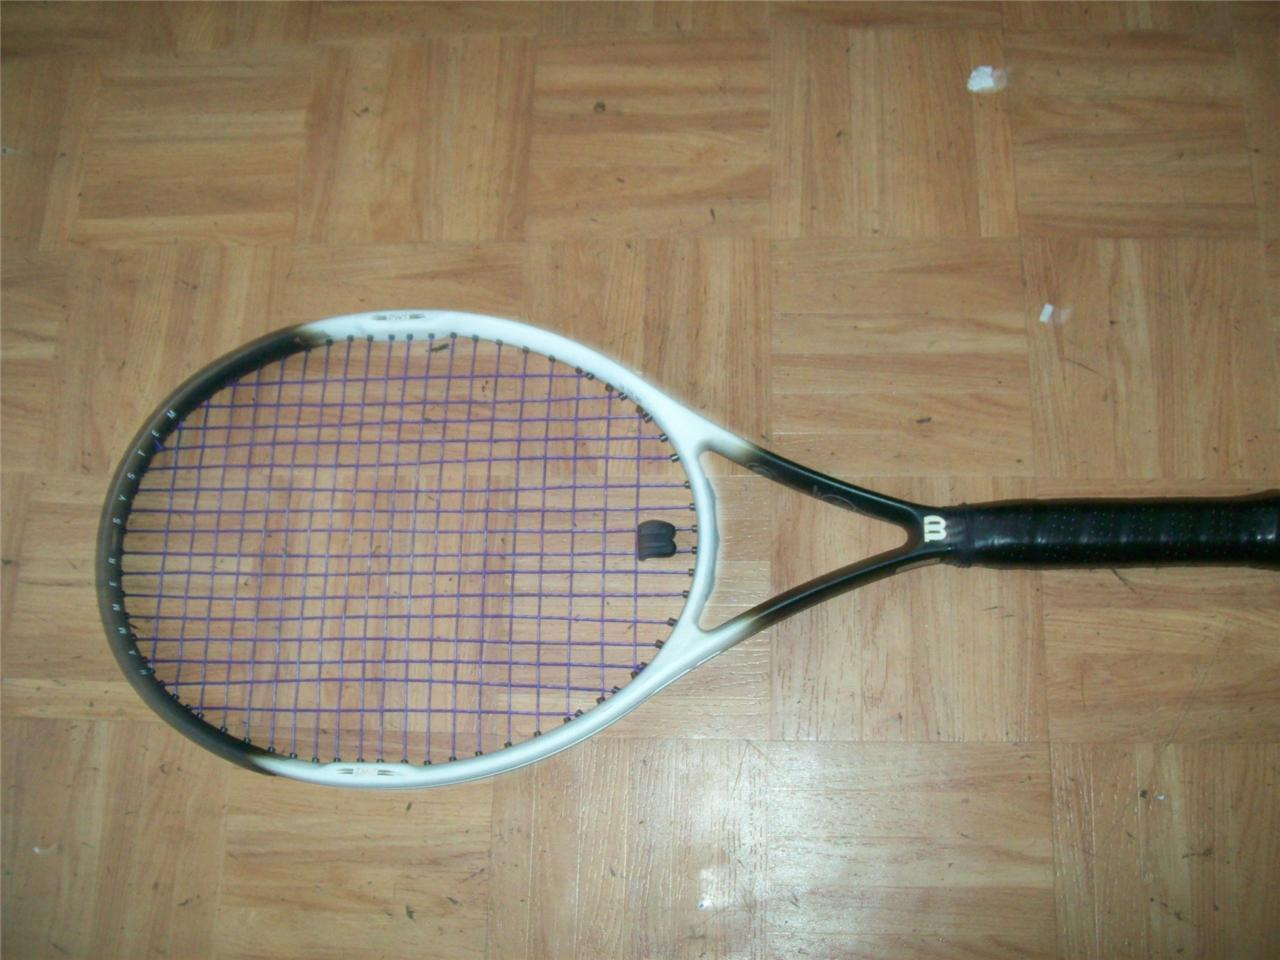 Wilson Hammer 6.2 os 110 4 1 2 Grip Tenis  Raqueta  salida